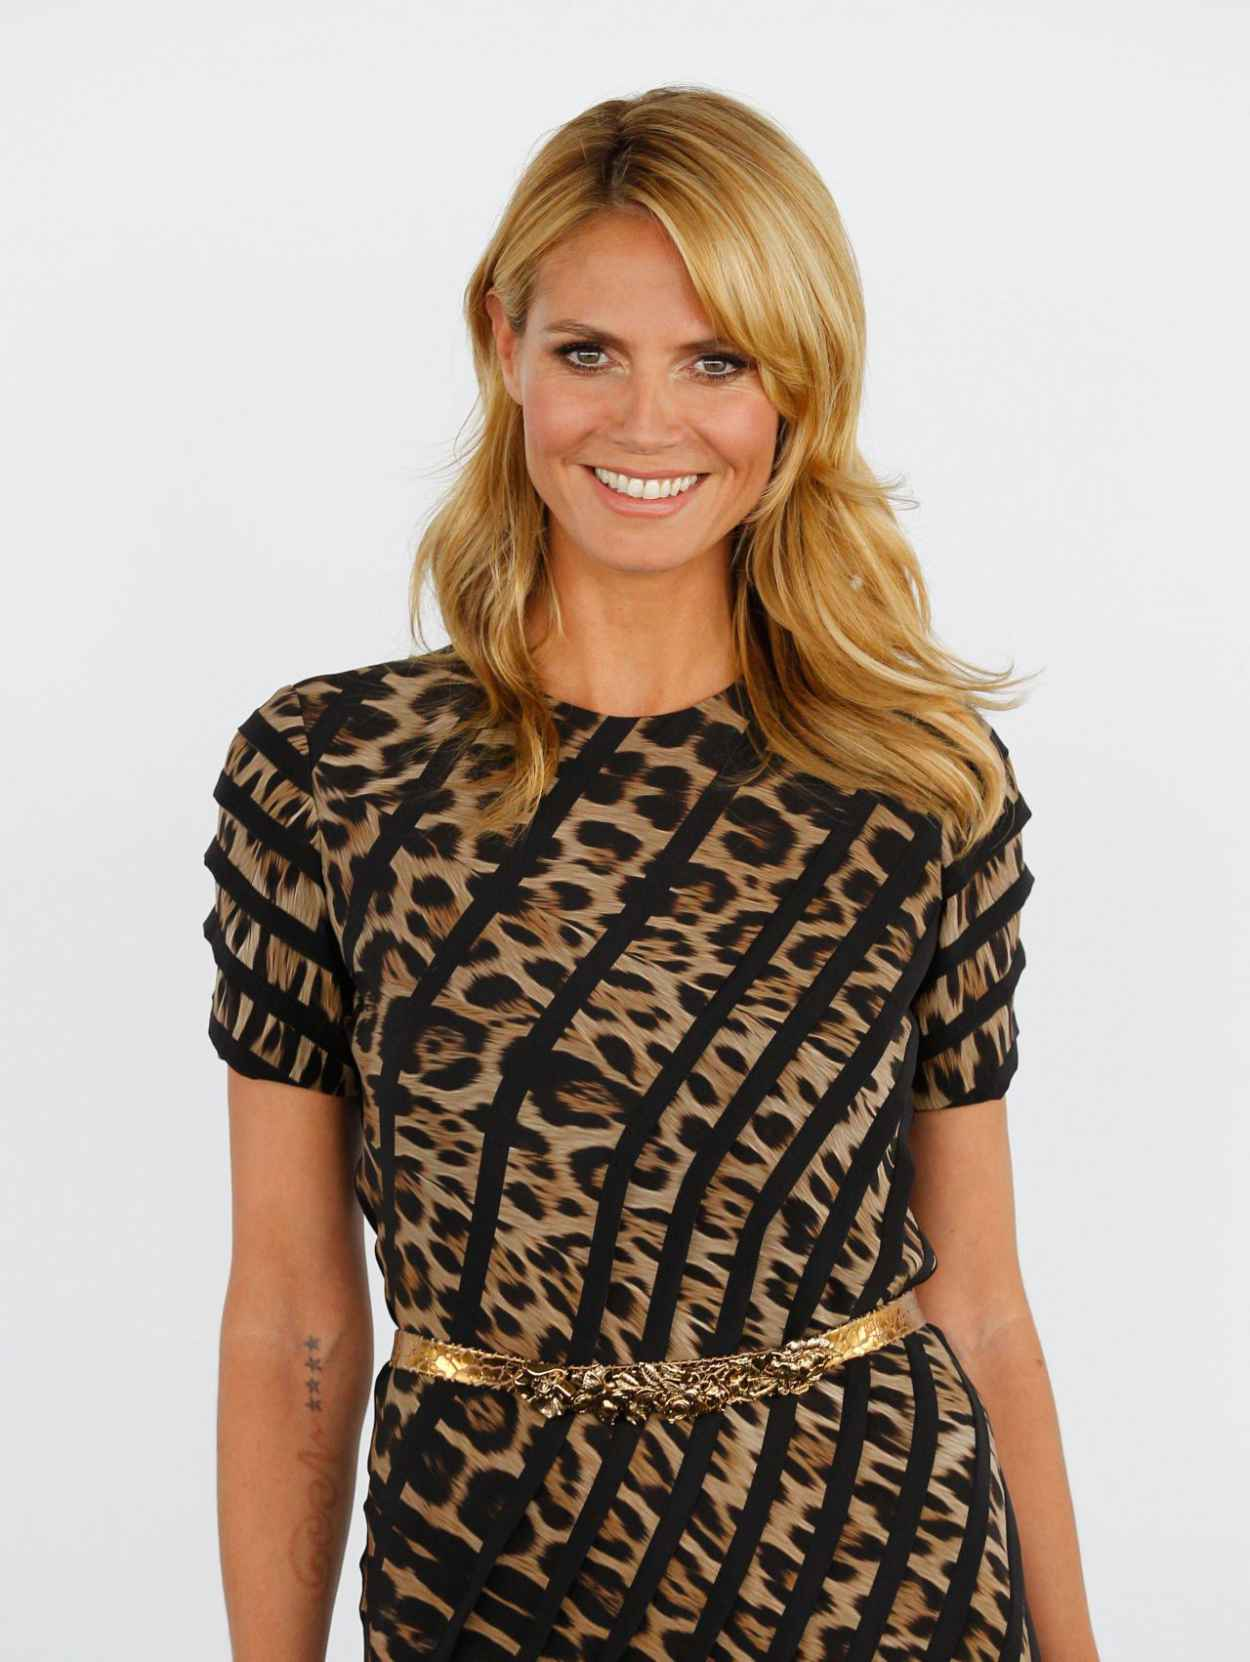 Heidi Klum Takes The Pajama Dressing Trend To Heart, Wears